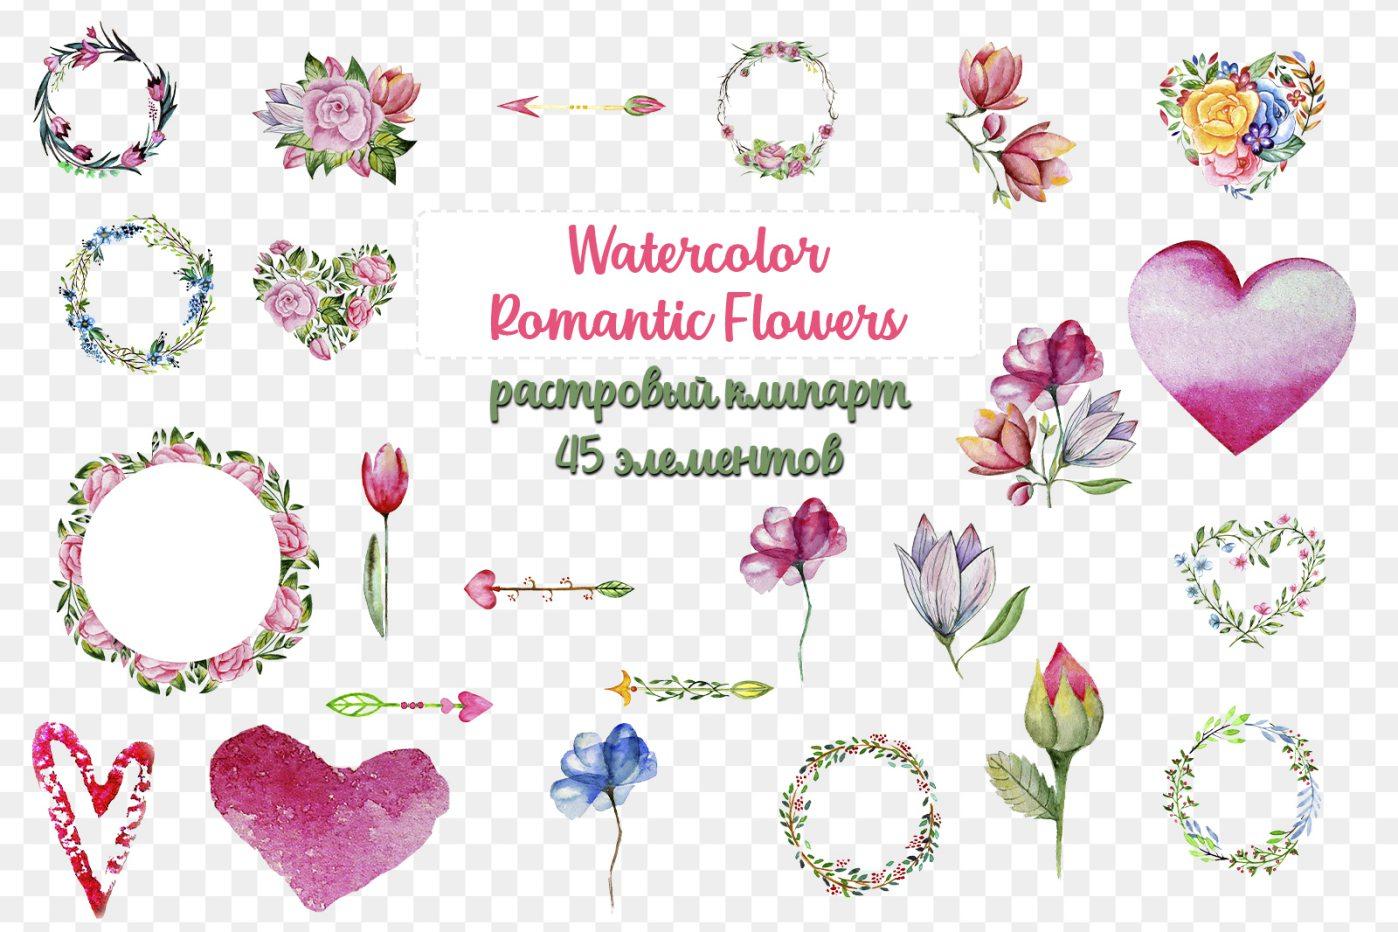 Watercolor Romantic Flowers